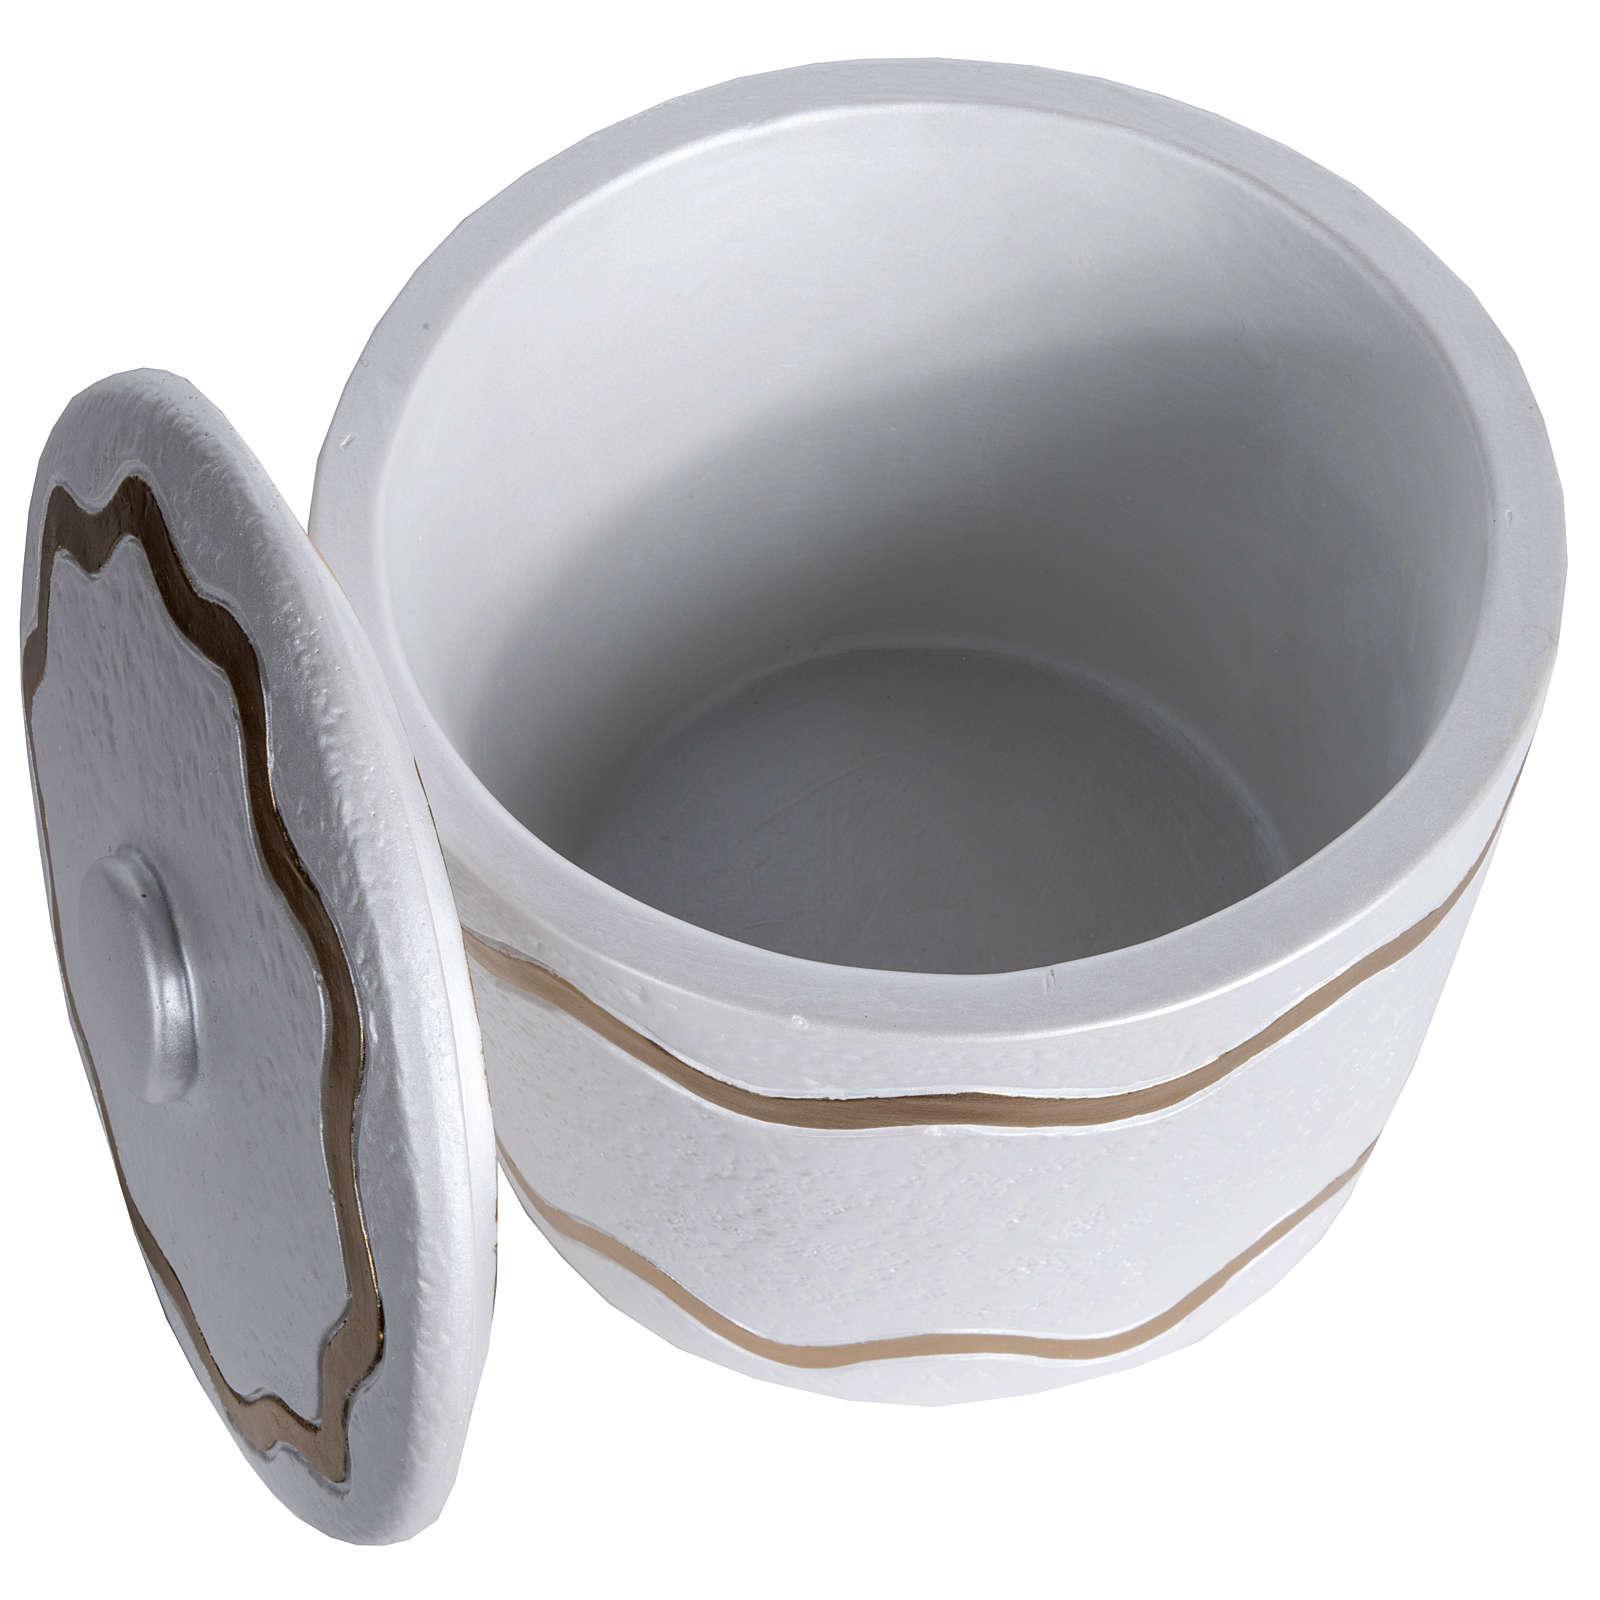 Urna funeraria marmo sintetico finitura madreperlata dorata 3